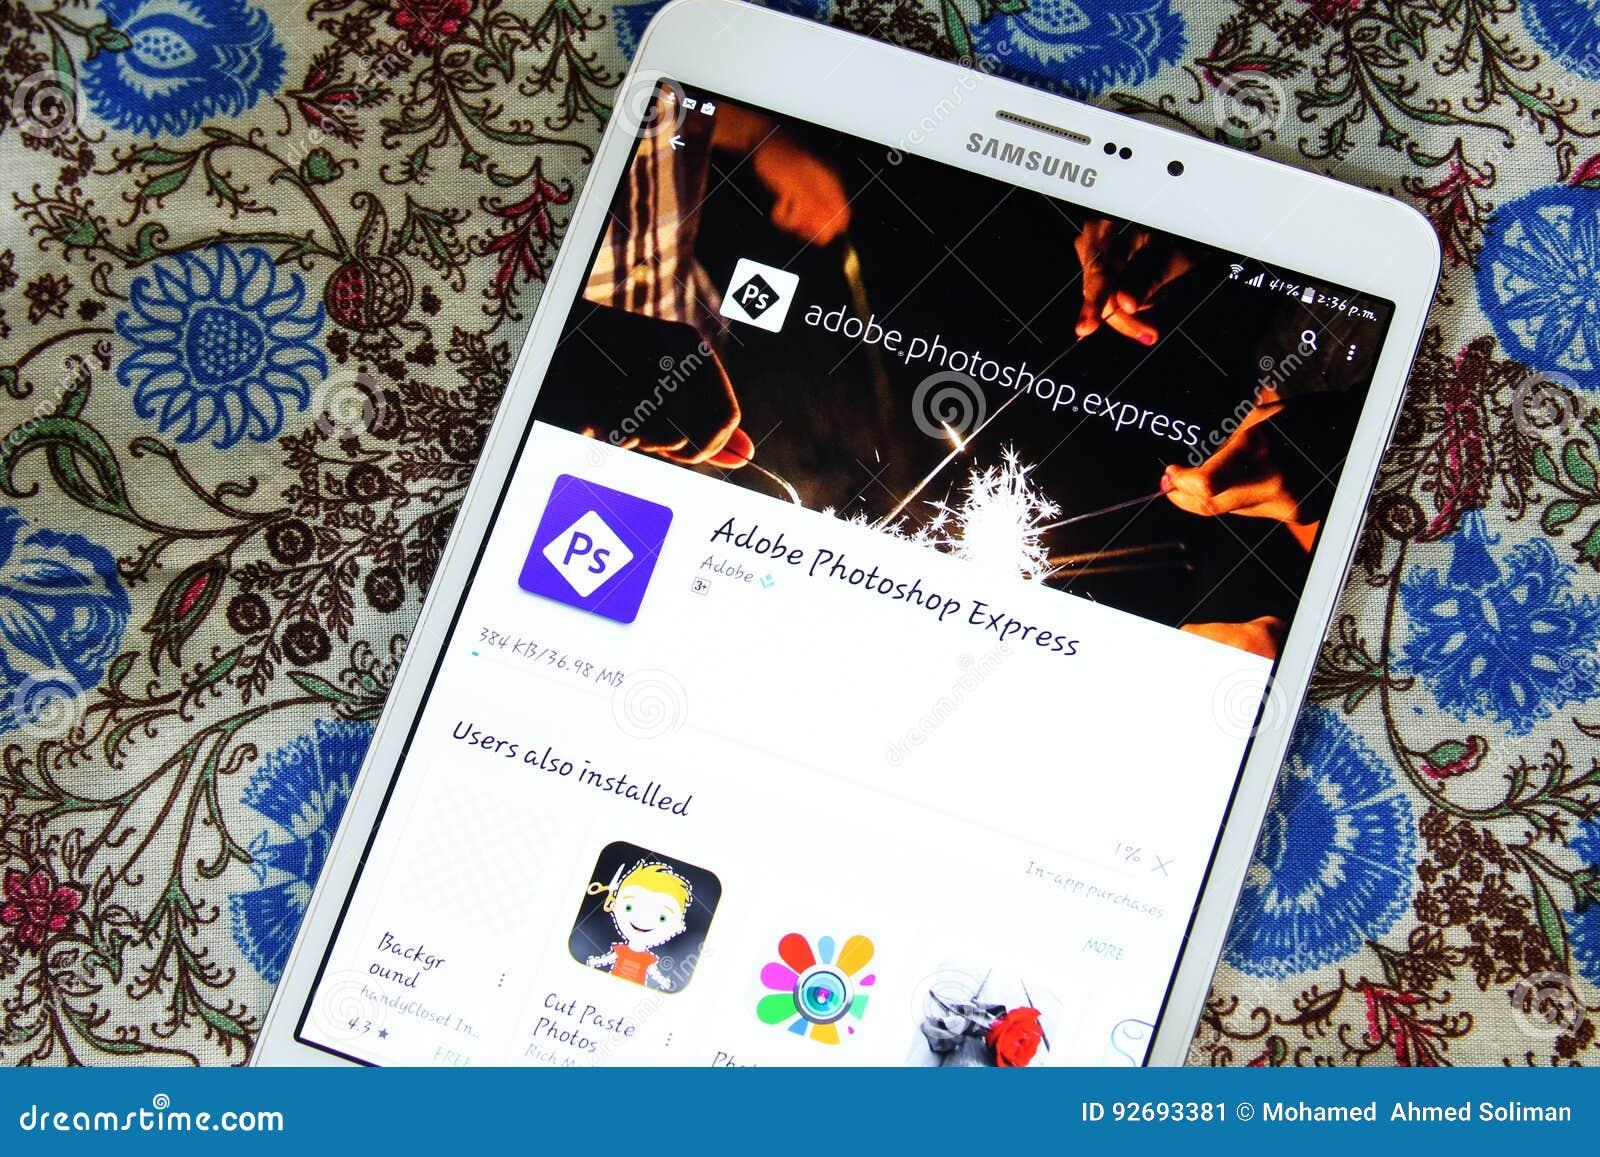 Adobe Photoshop Express App Editorial Photo - Image of